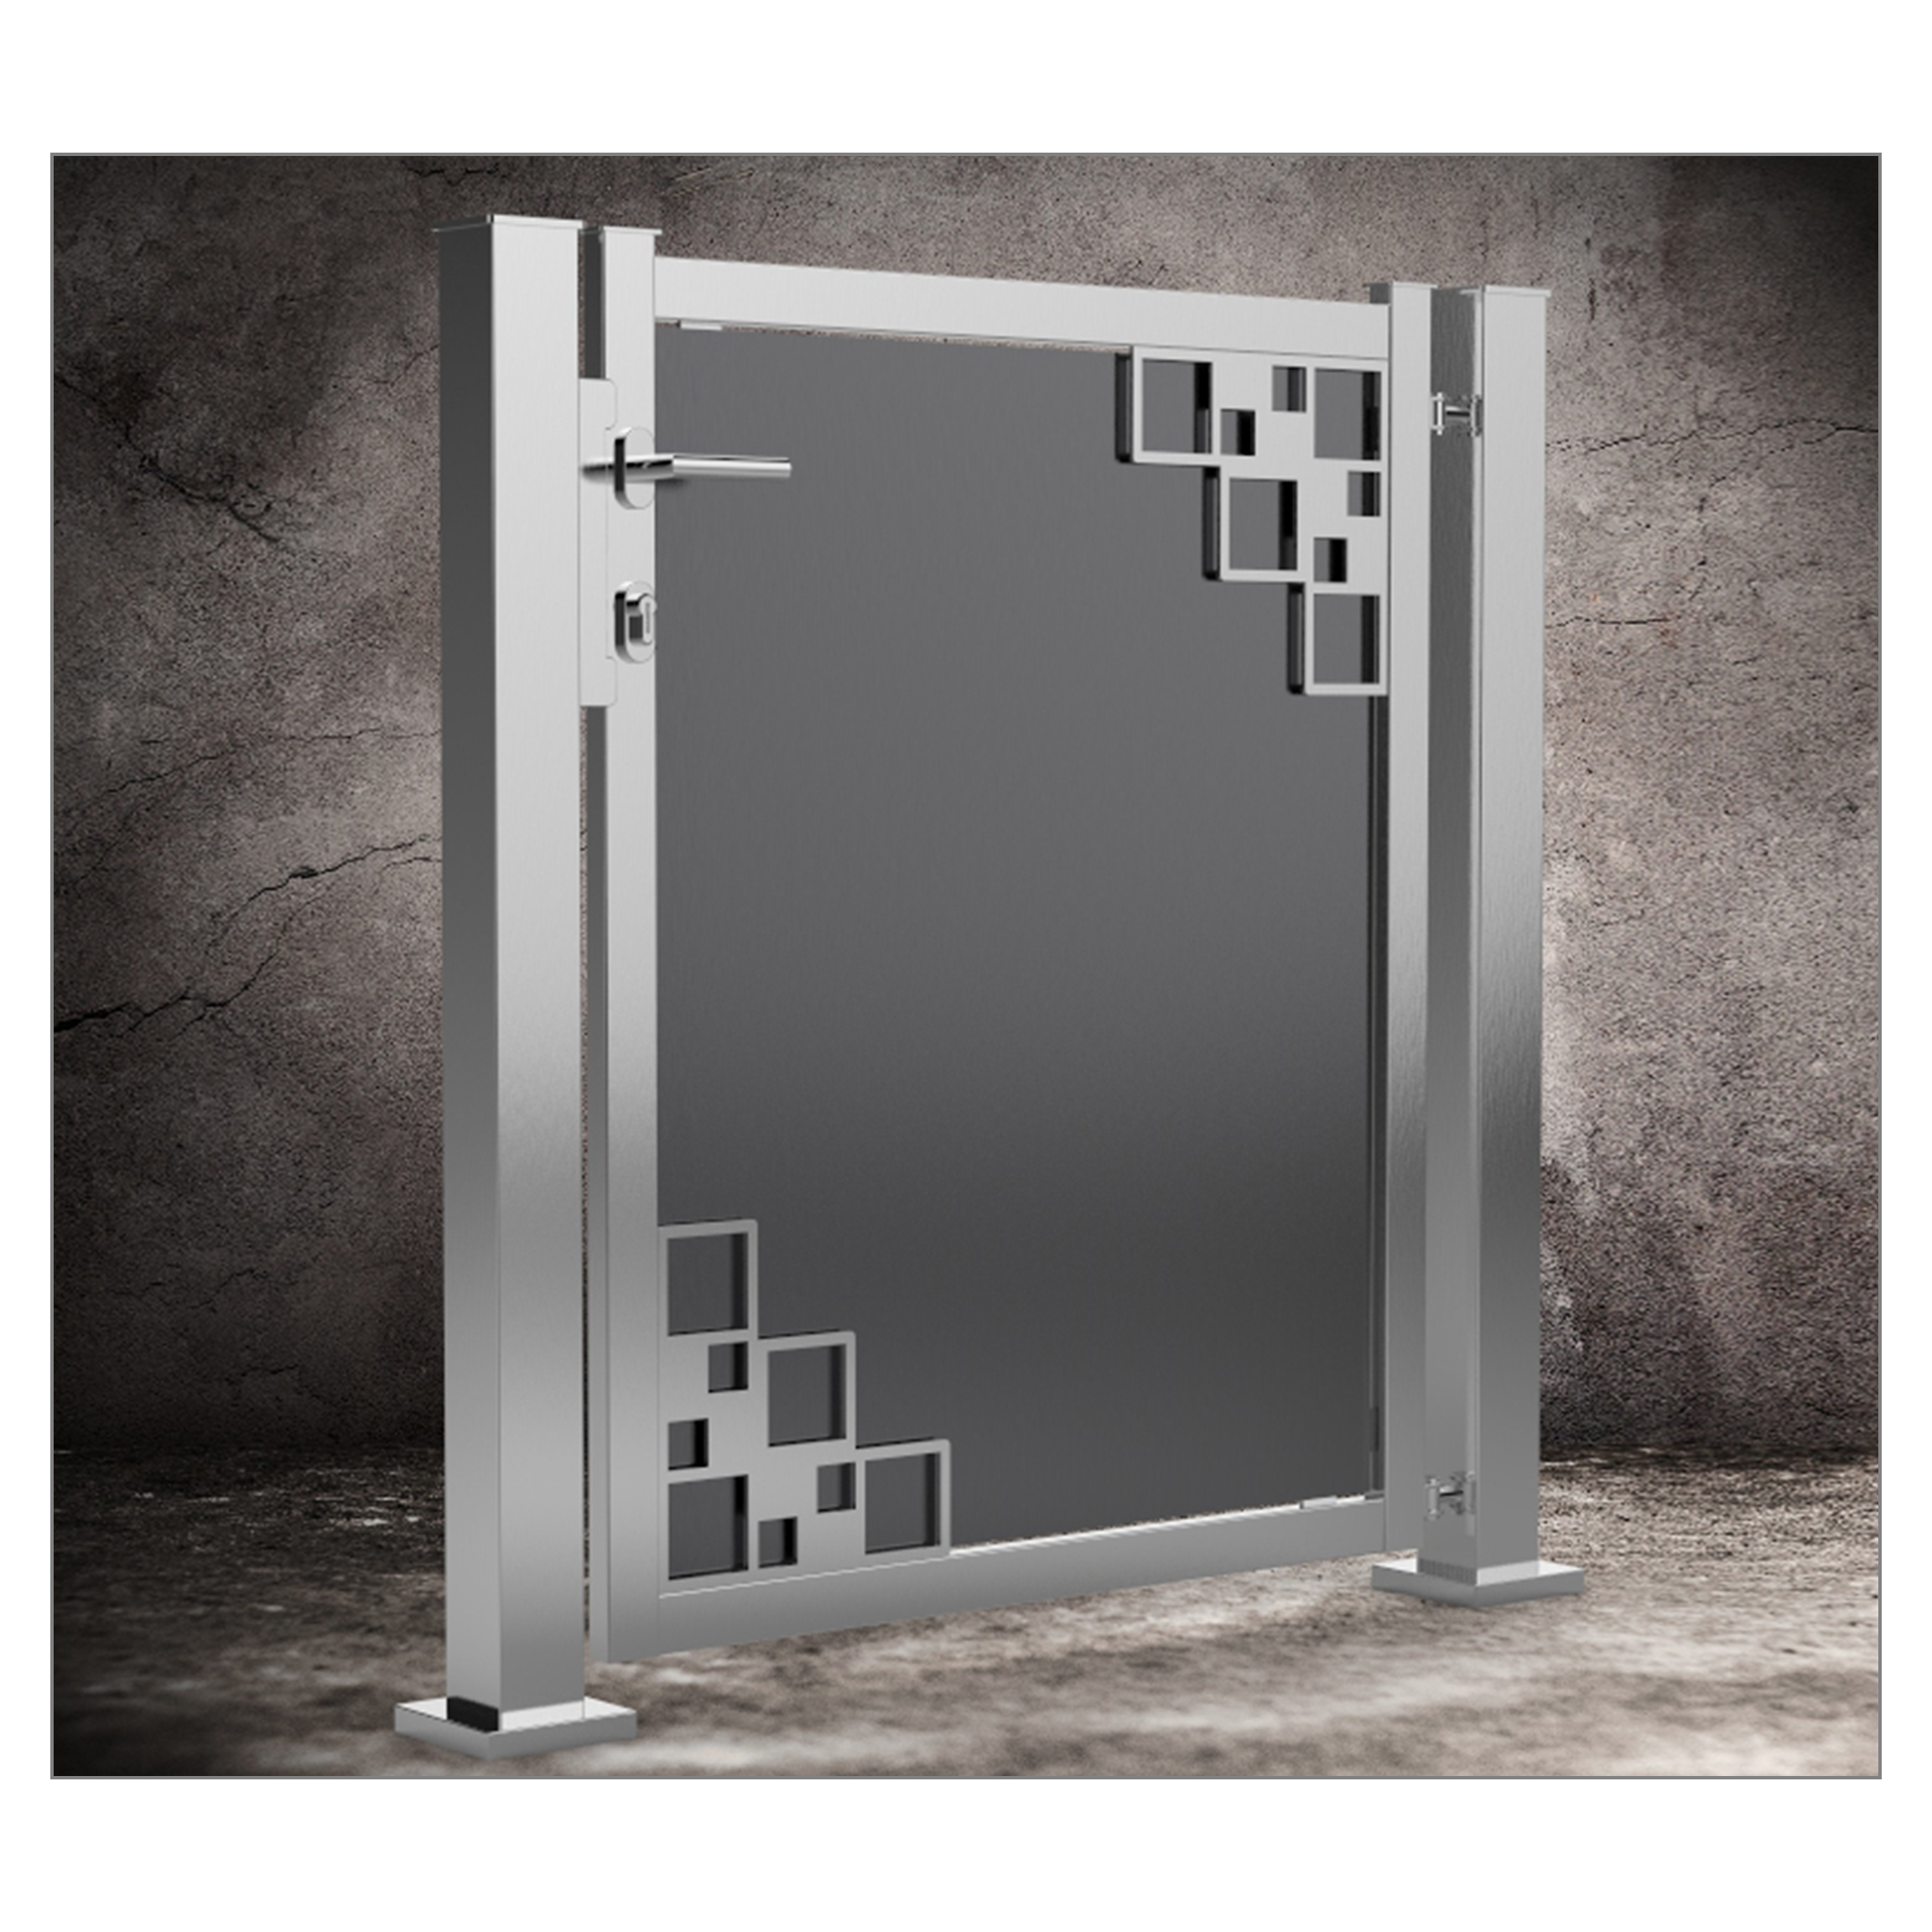 schlosskasten gartentor swalif. Black Bedroom Furniture Sets. Home Design Ideas